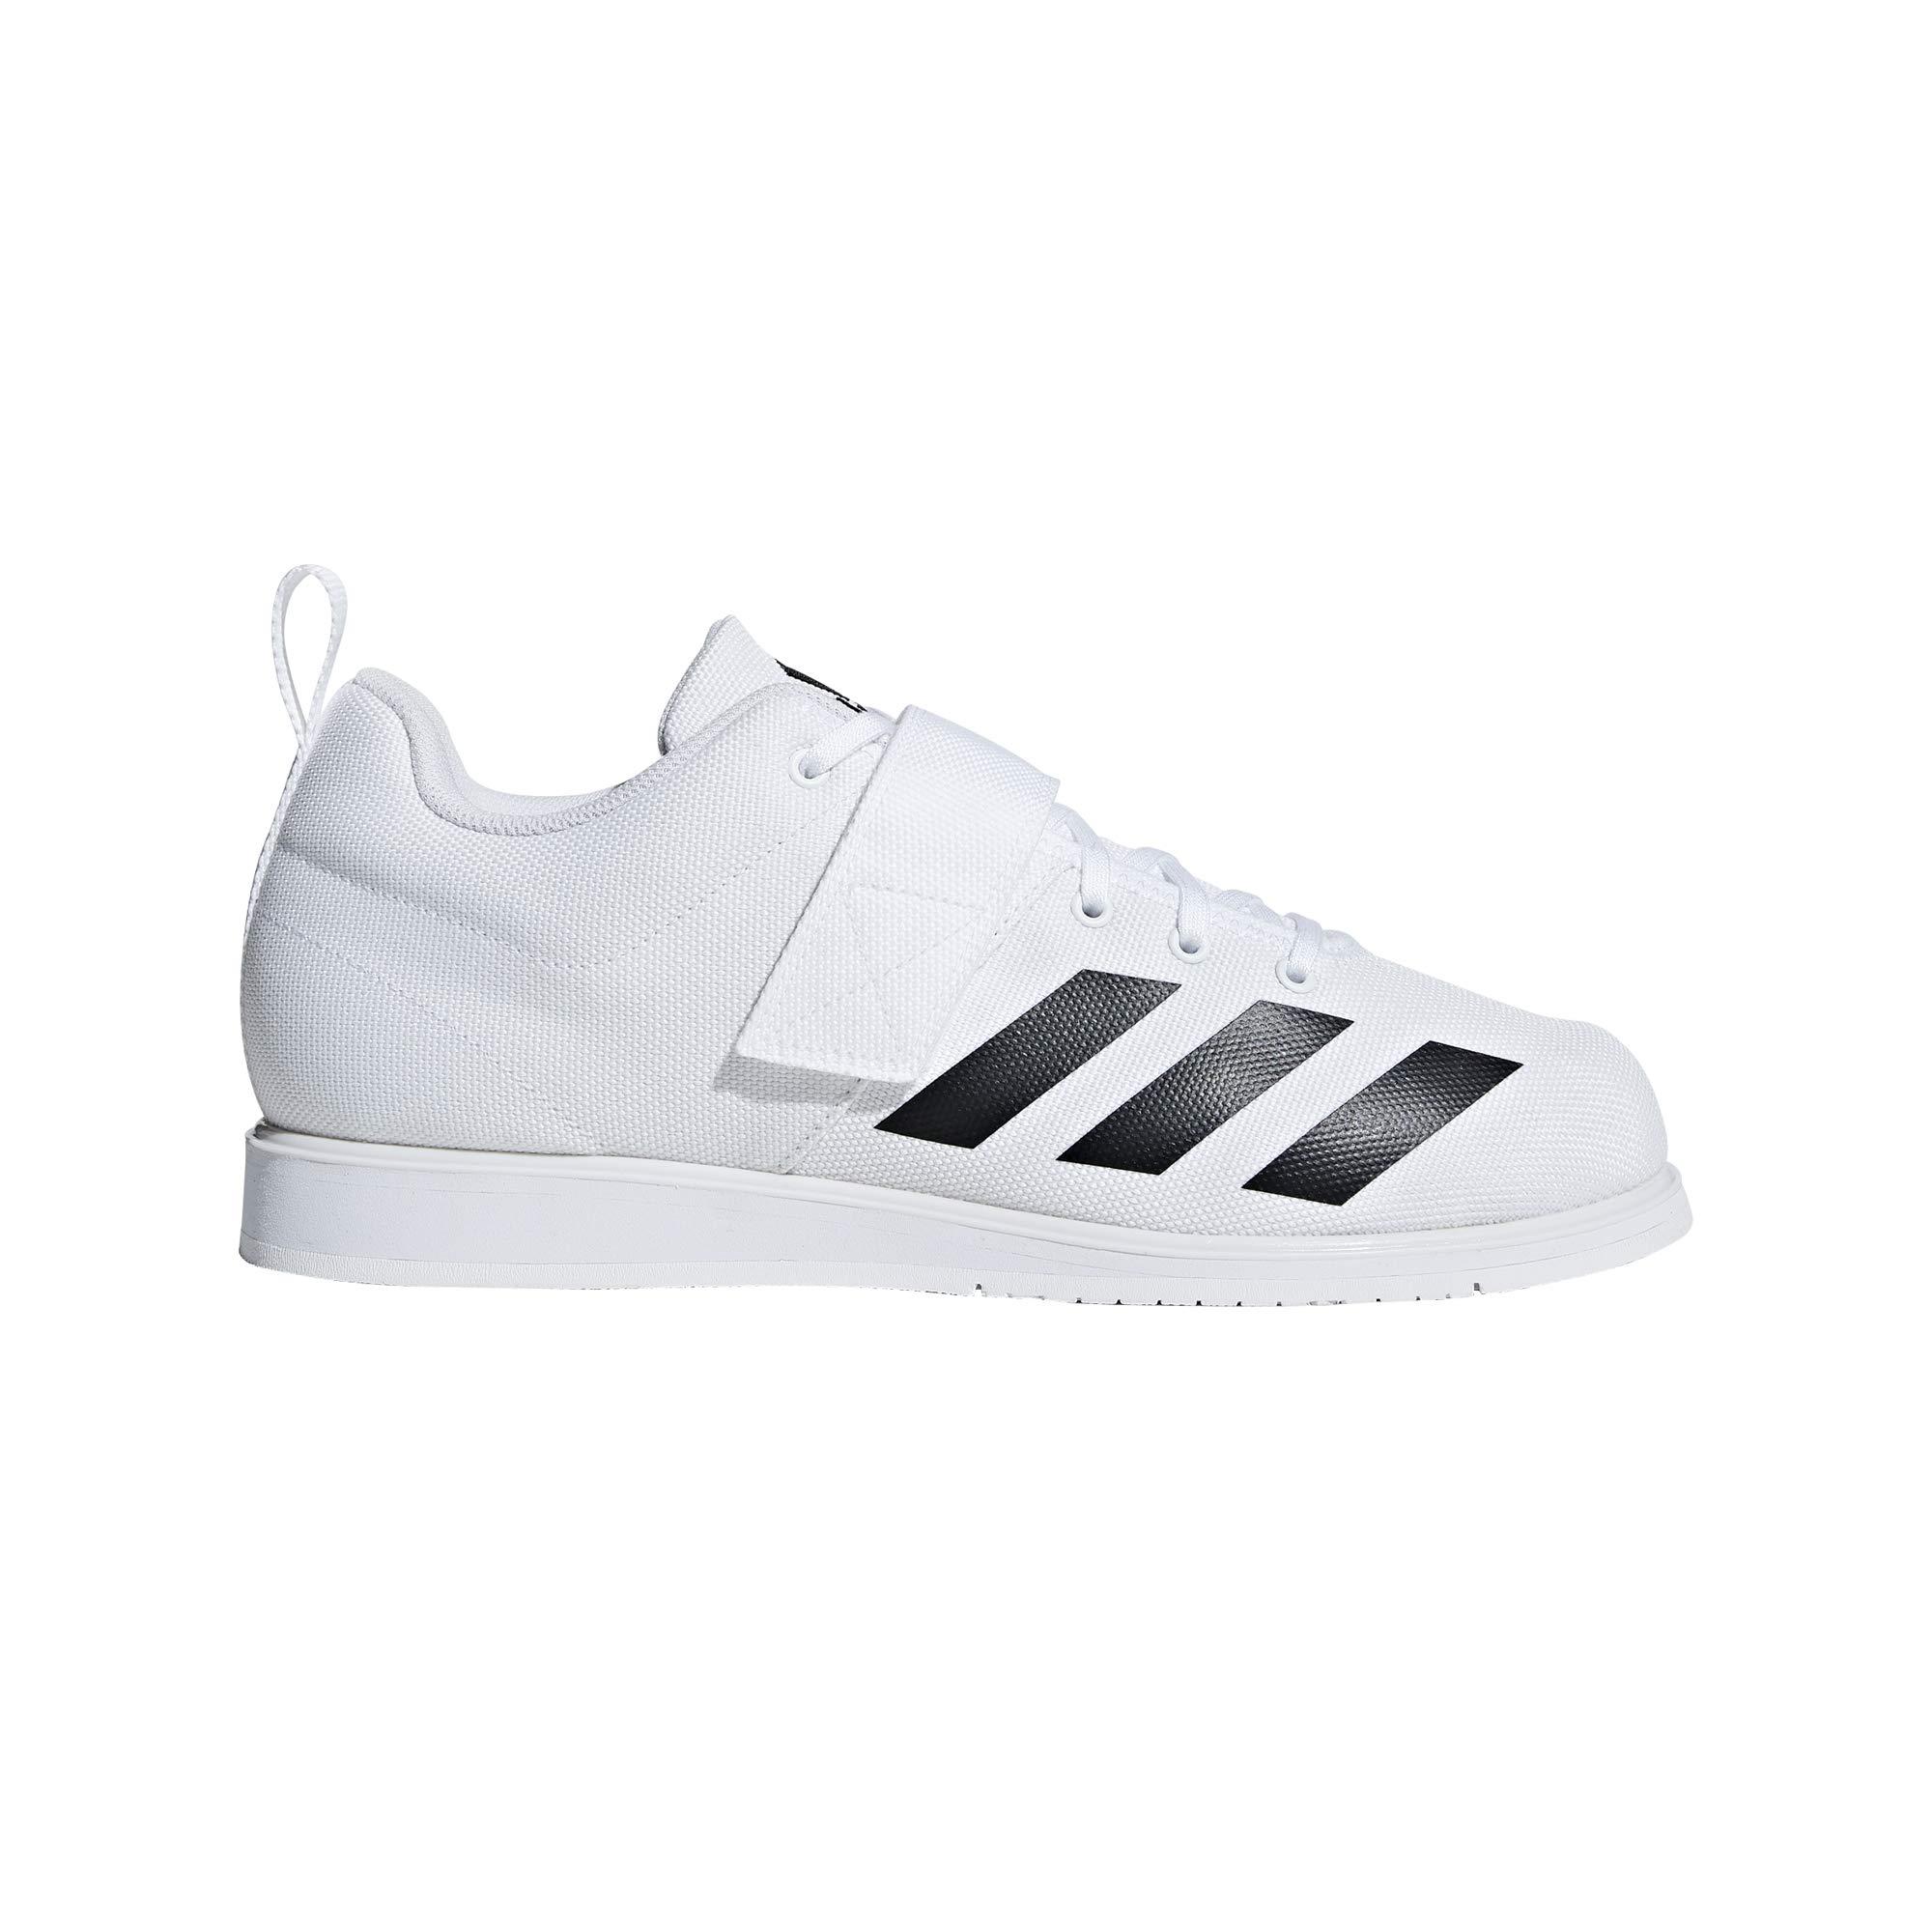 adidas Men's Powerlift 4, Black/White, 4 M US